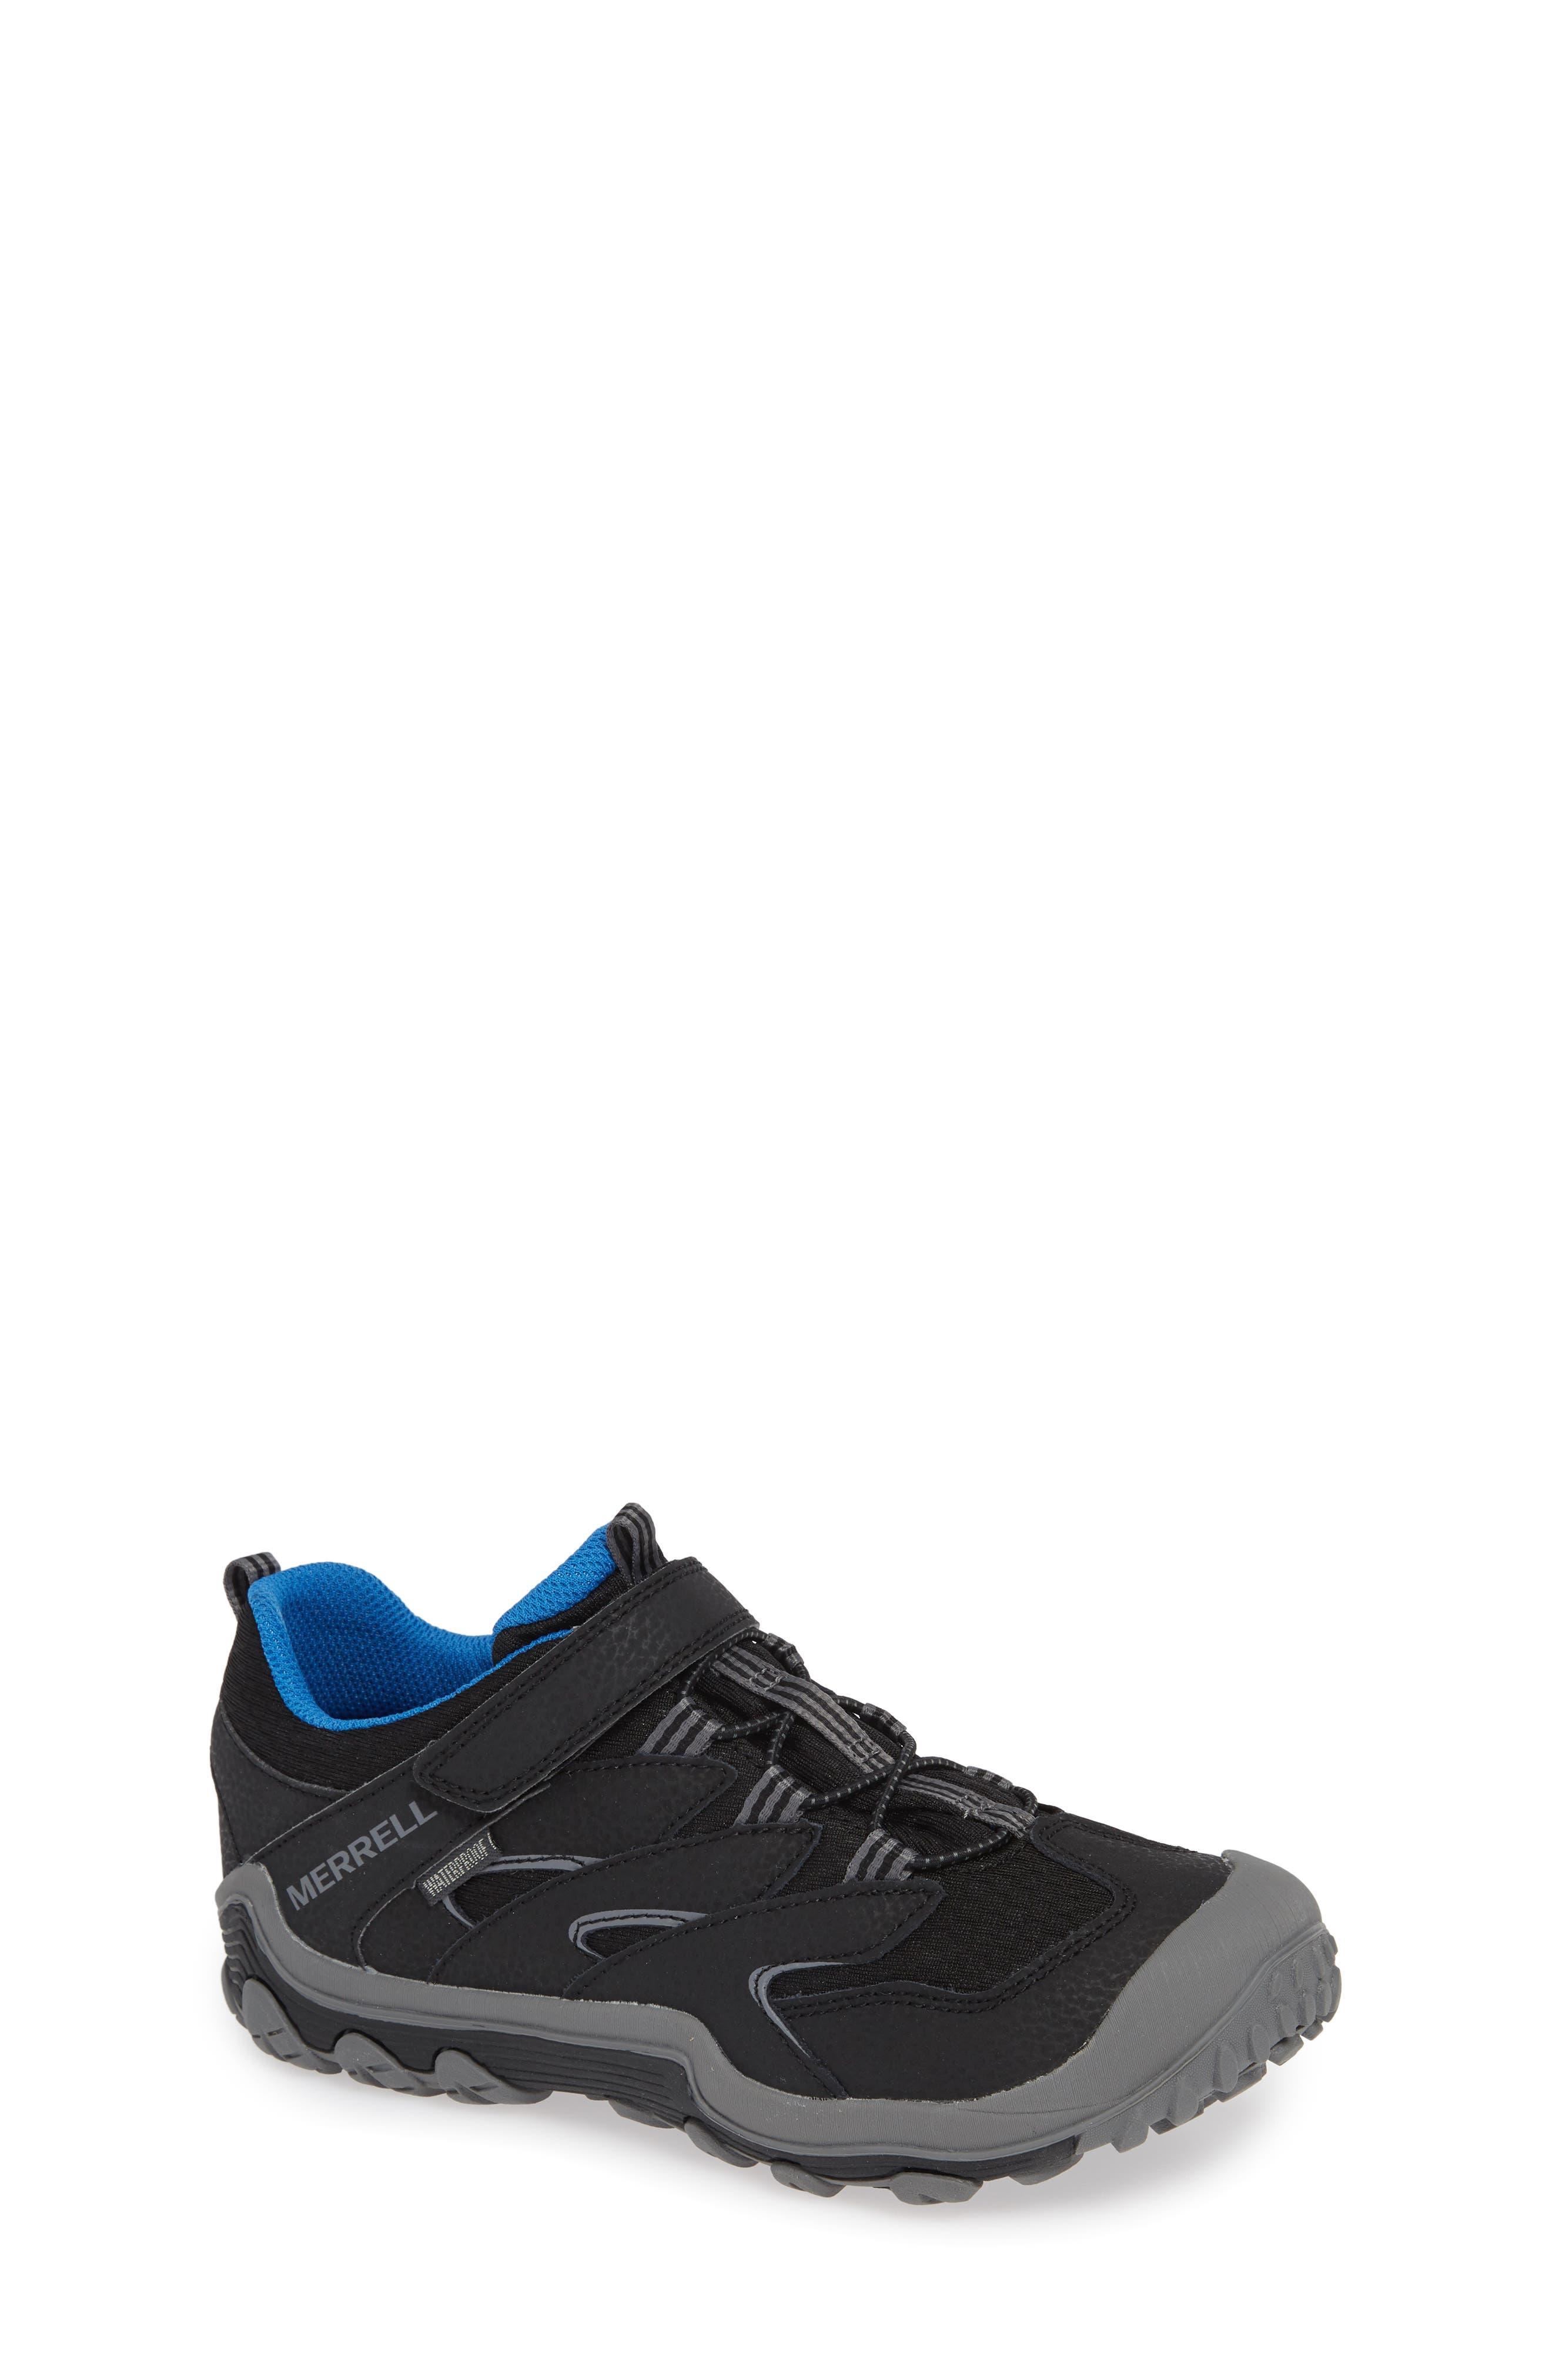 Chameleon 7 Waterproof Sneaker,                         Main,                         color, BLACK